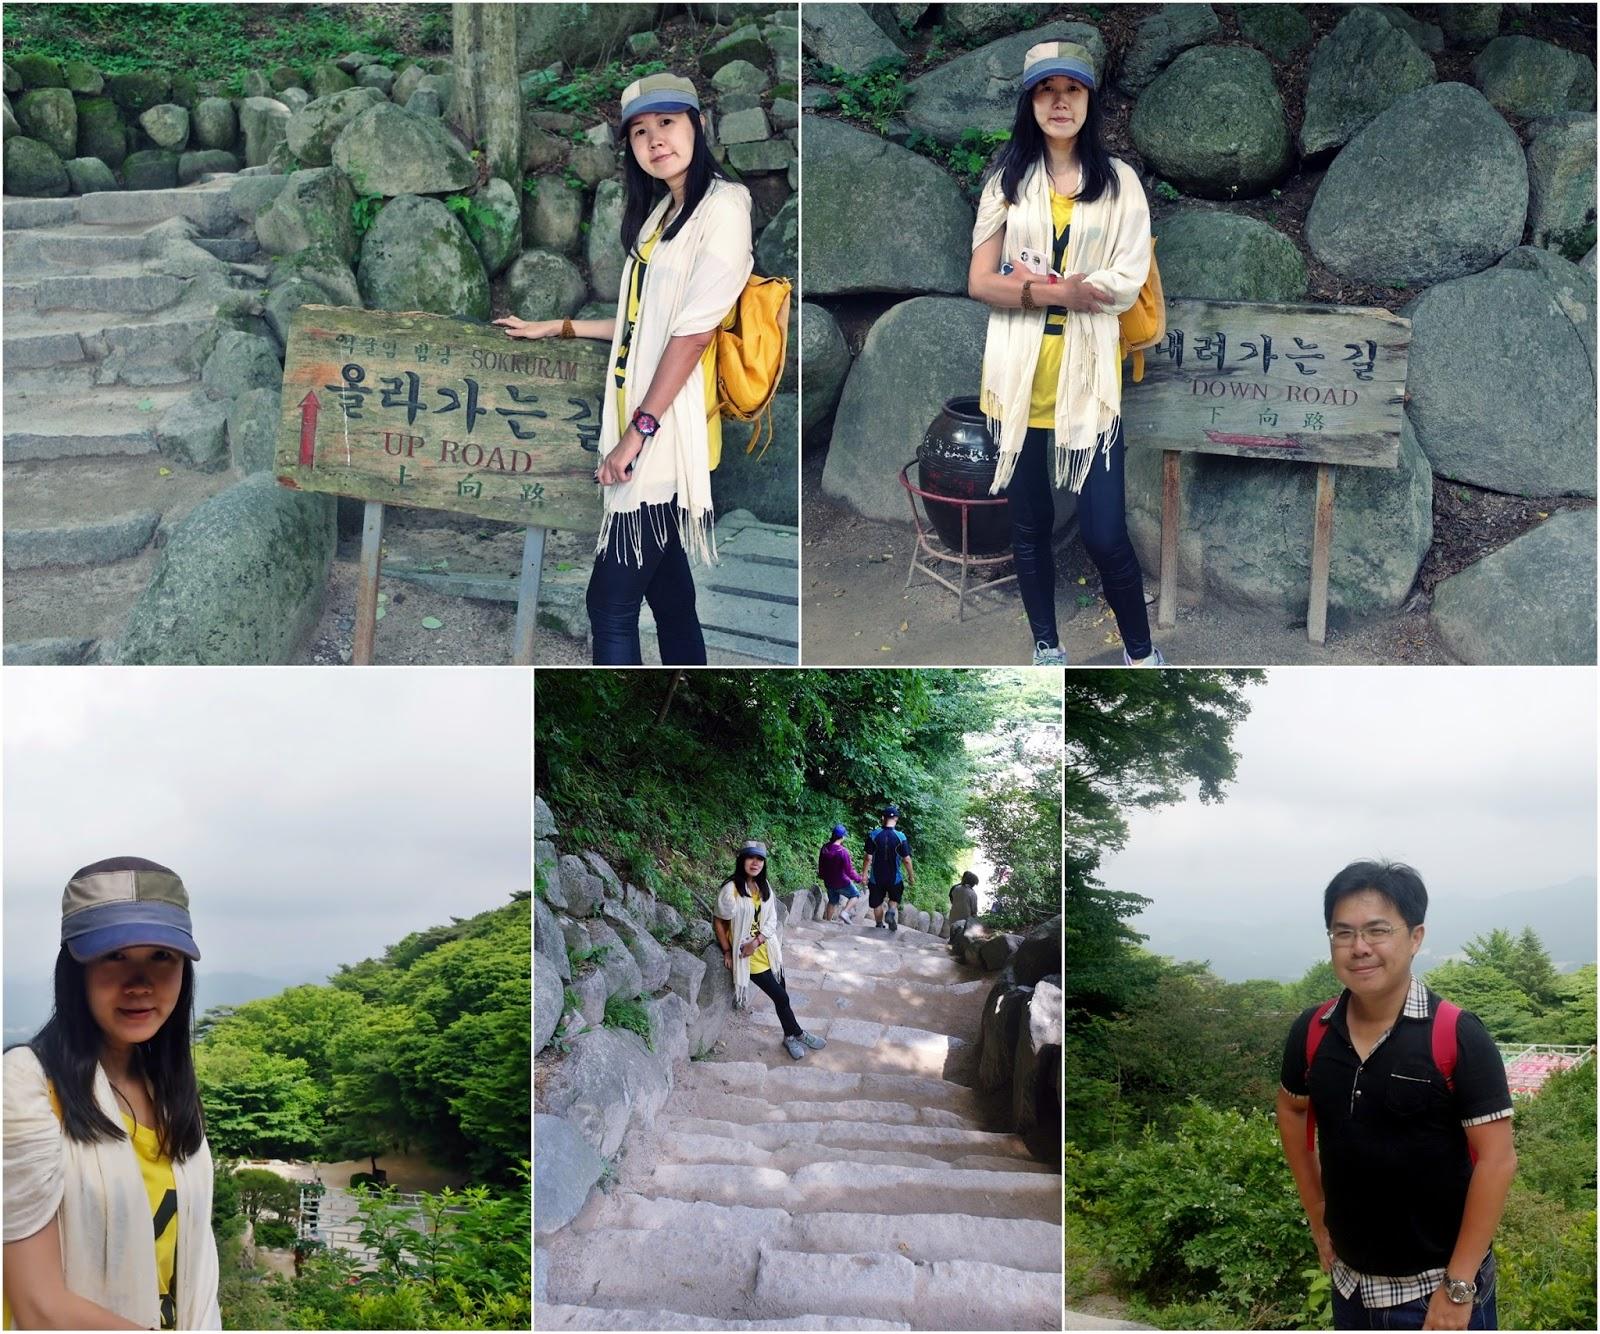 [Gyeongju] Bulguksa Temple and Seokguram Grotto  meheartsoul.blogspot.com